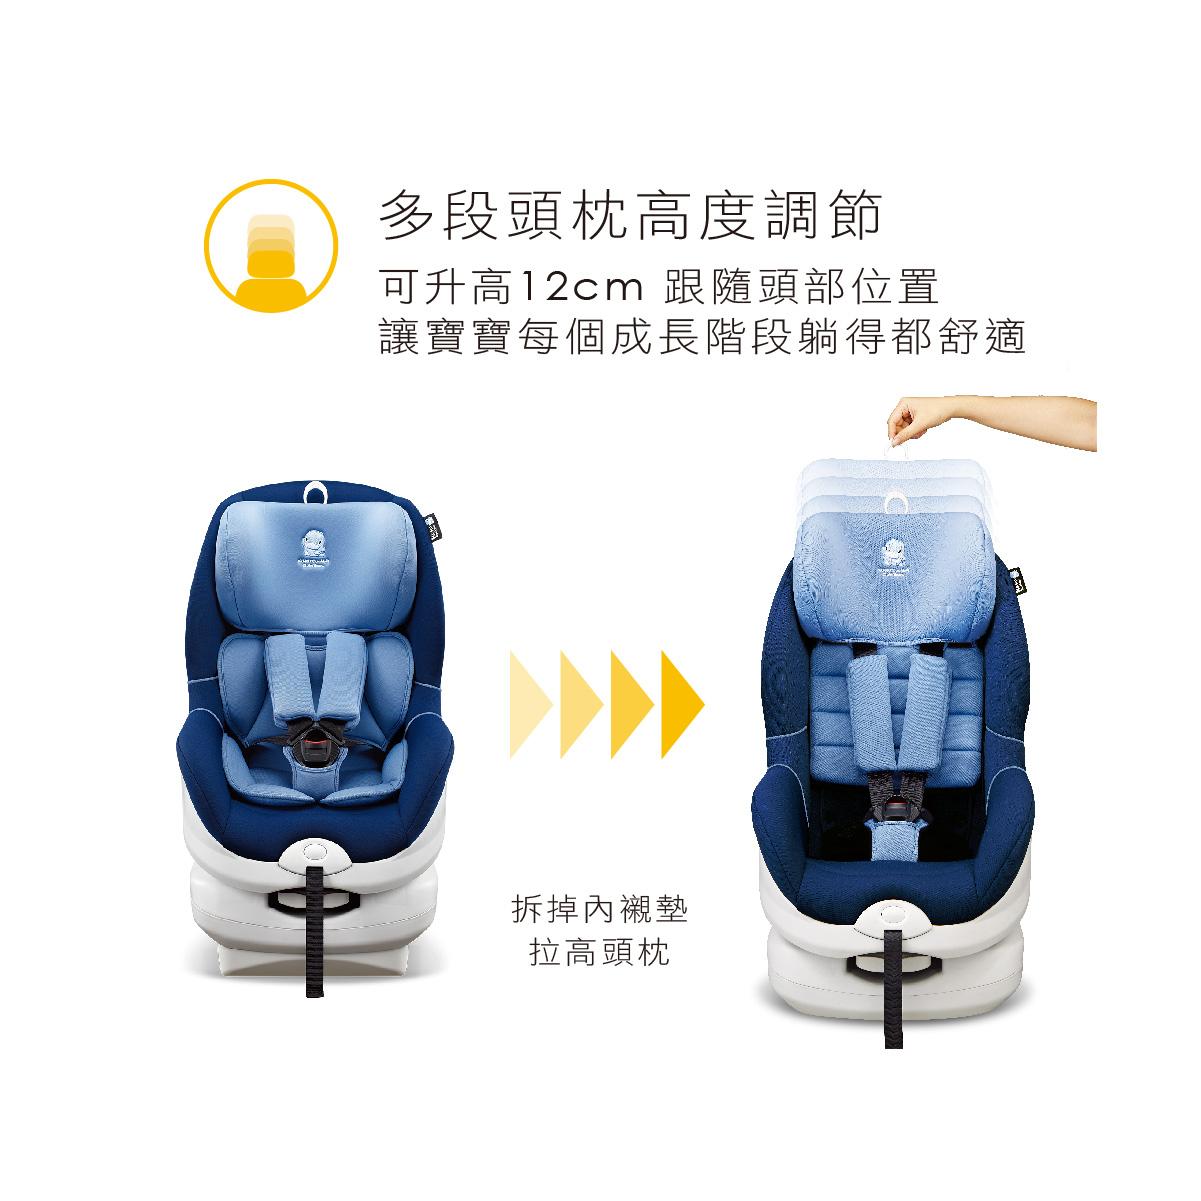 proimages/Tip_Accessories_Series/safety_seat/6039/6039_EDM_1200x1200-3-15.jpg